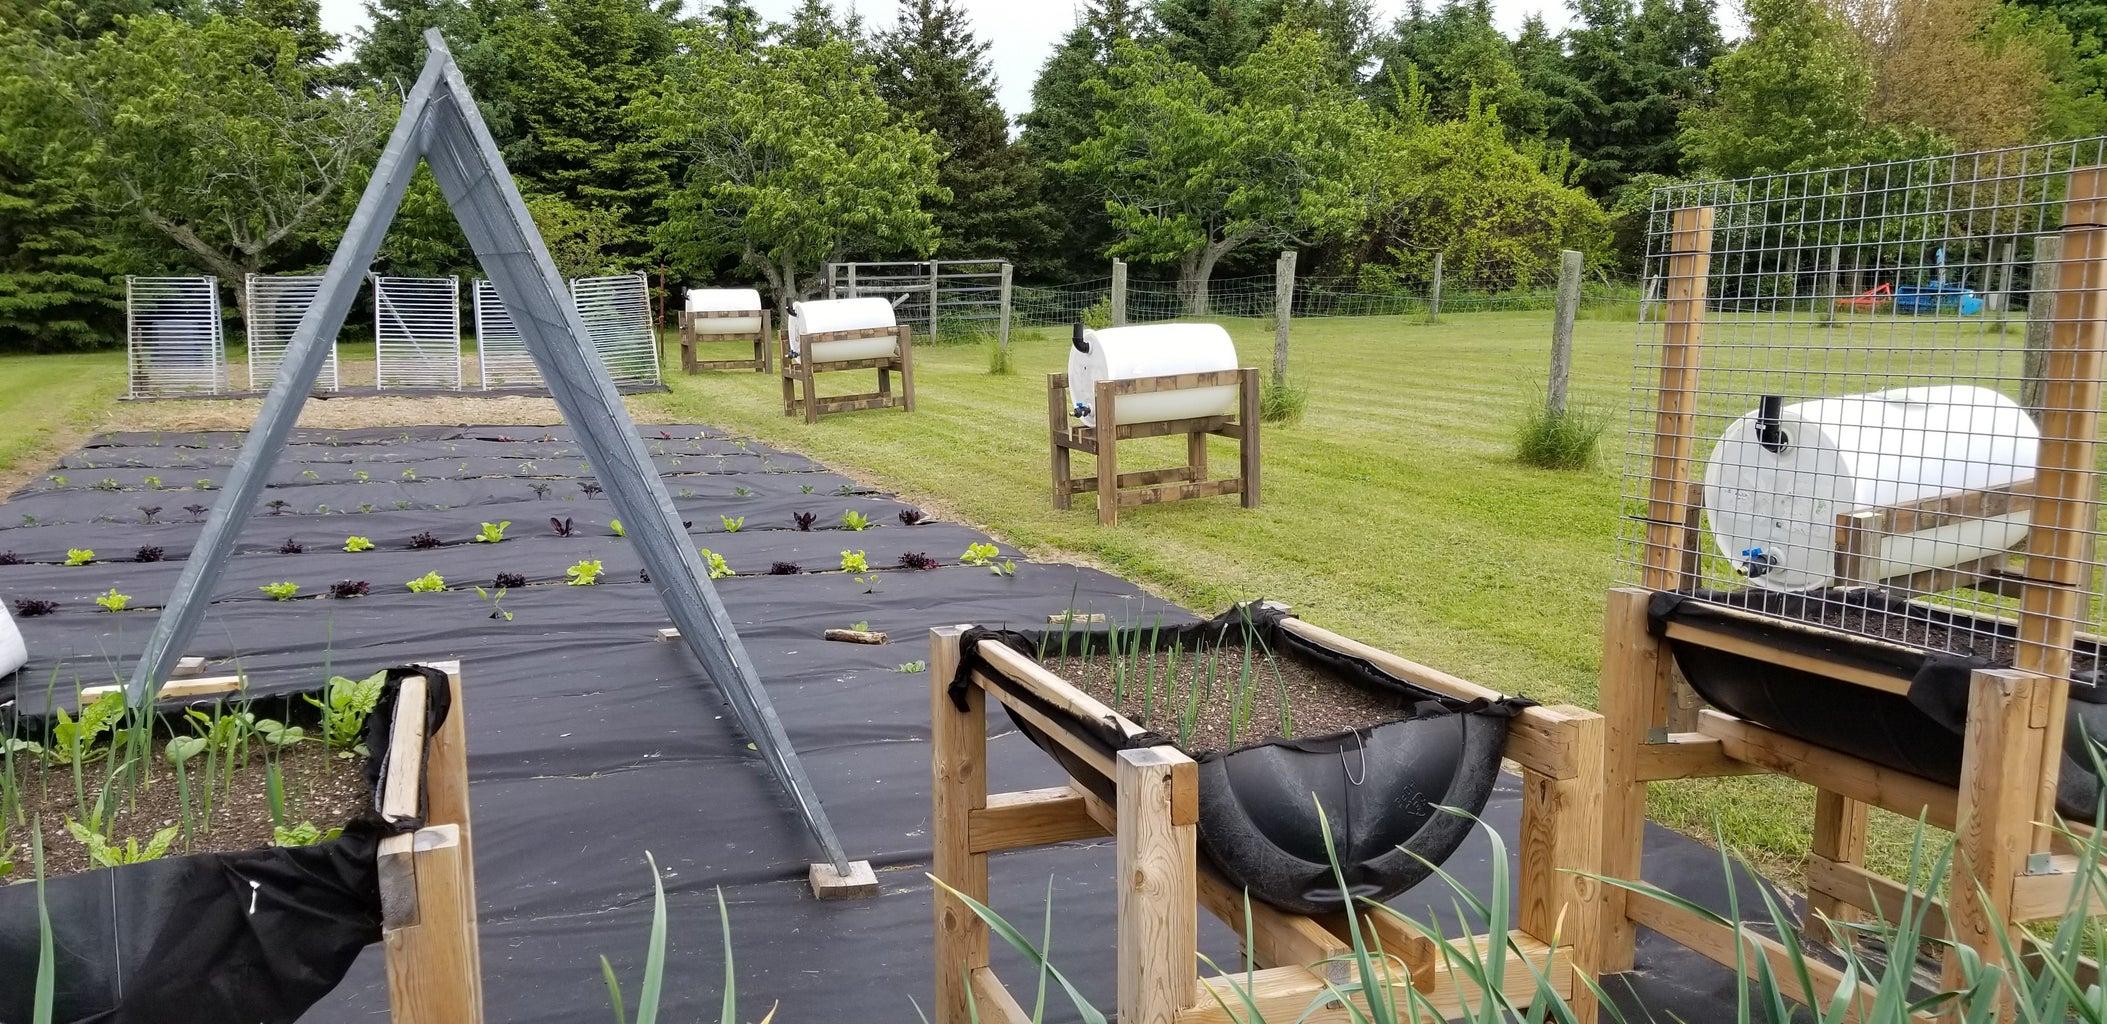 Preparing to Water the Garden